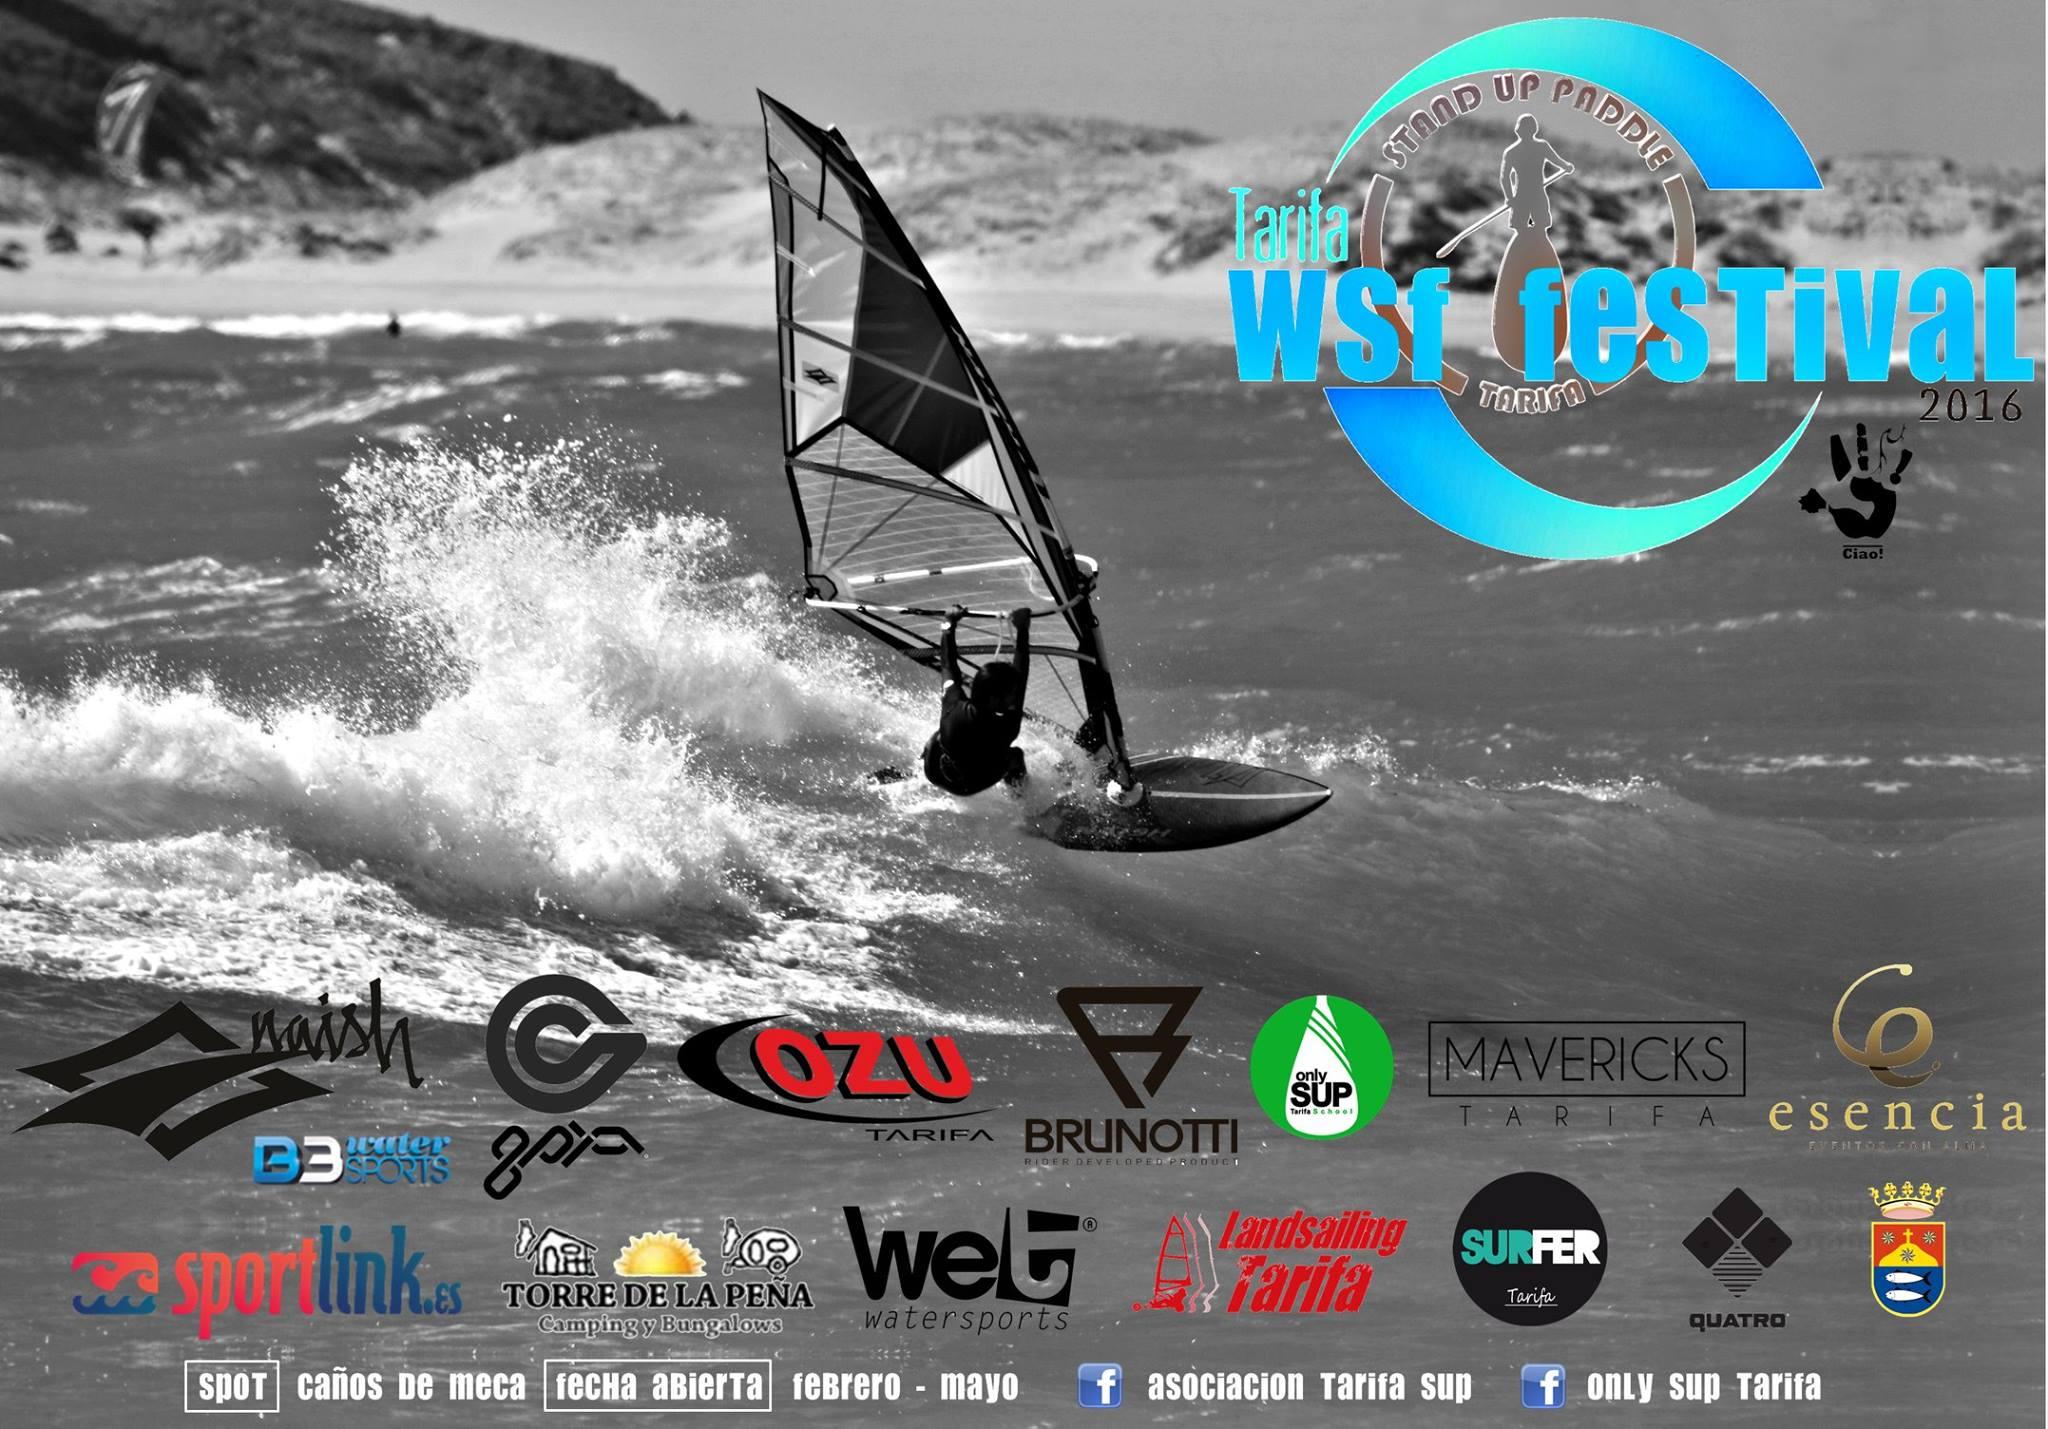 tarifa_windsurf_festival_2016